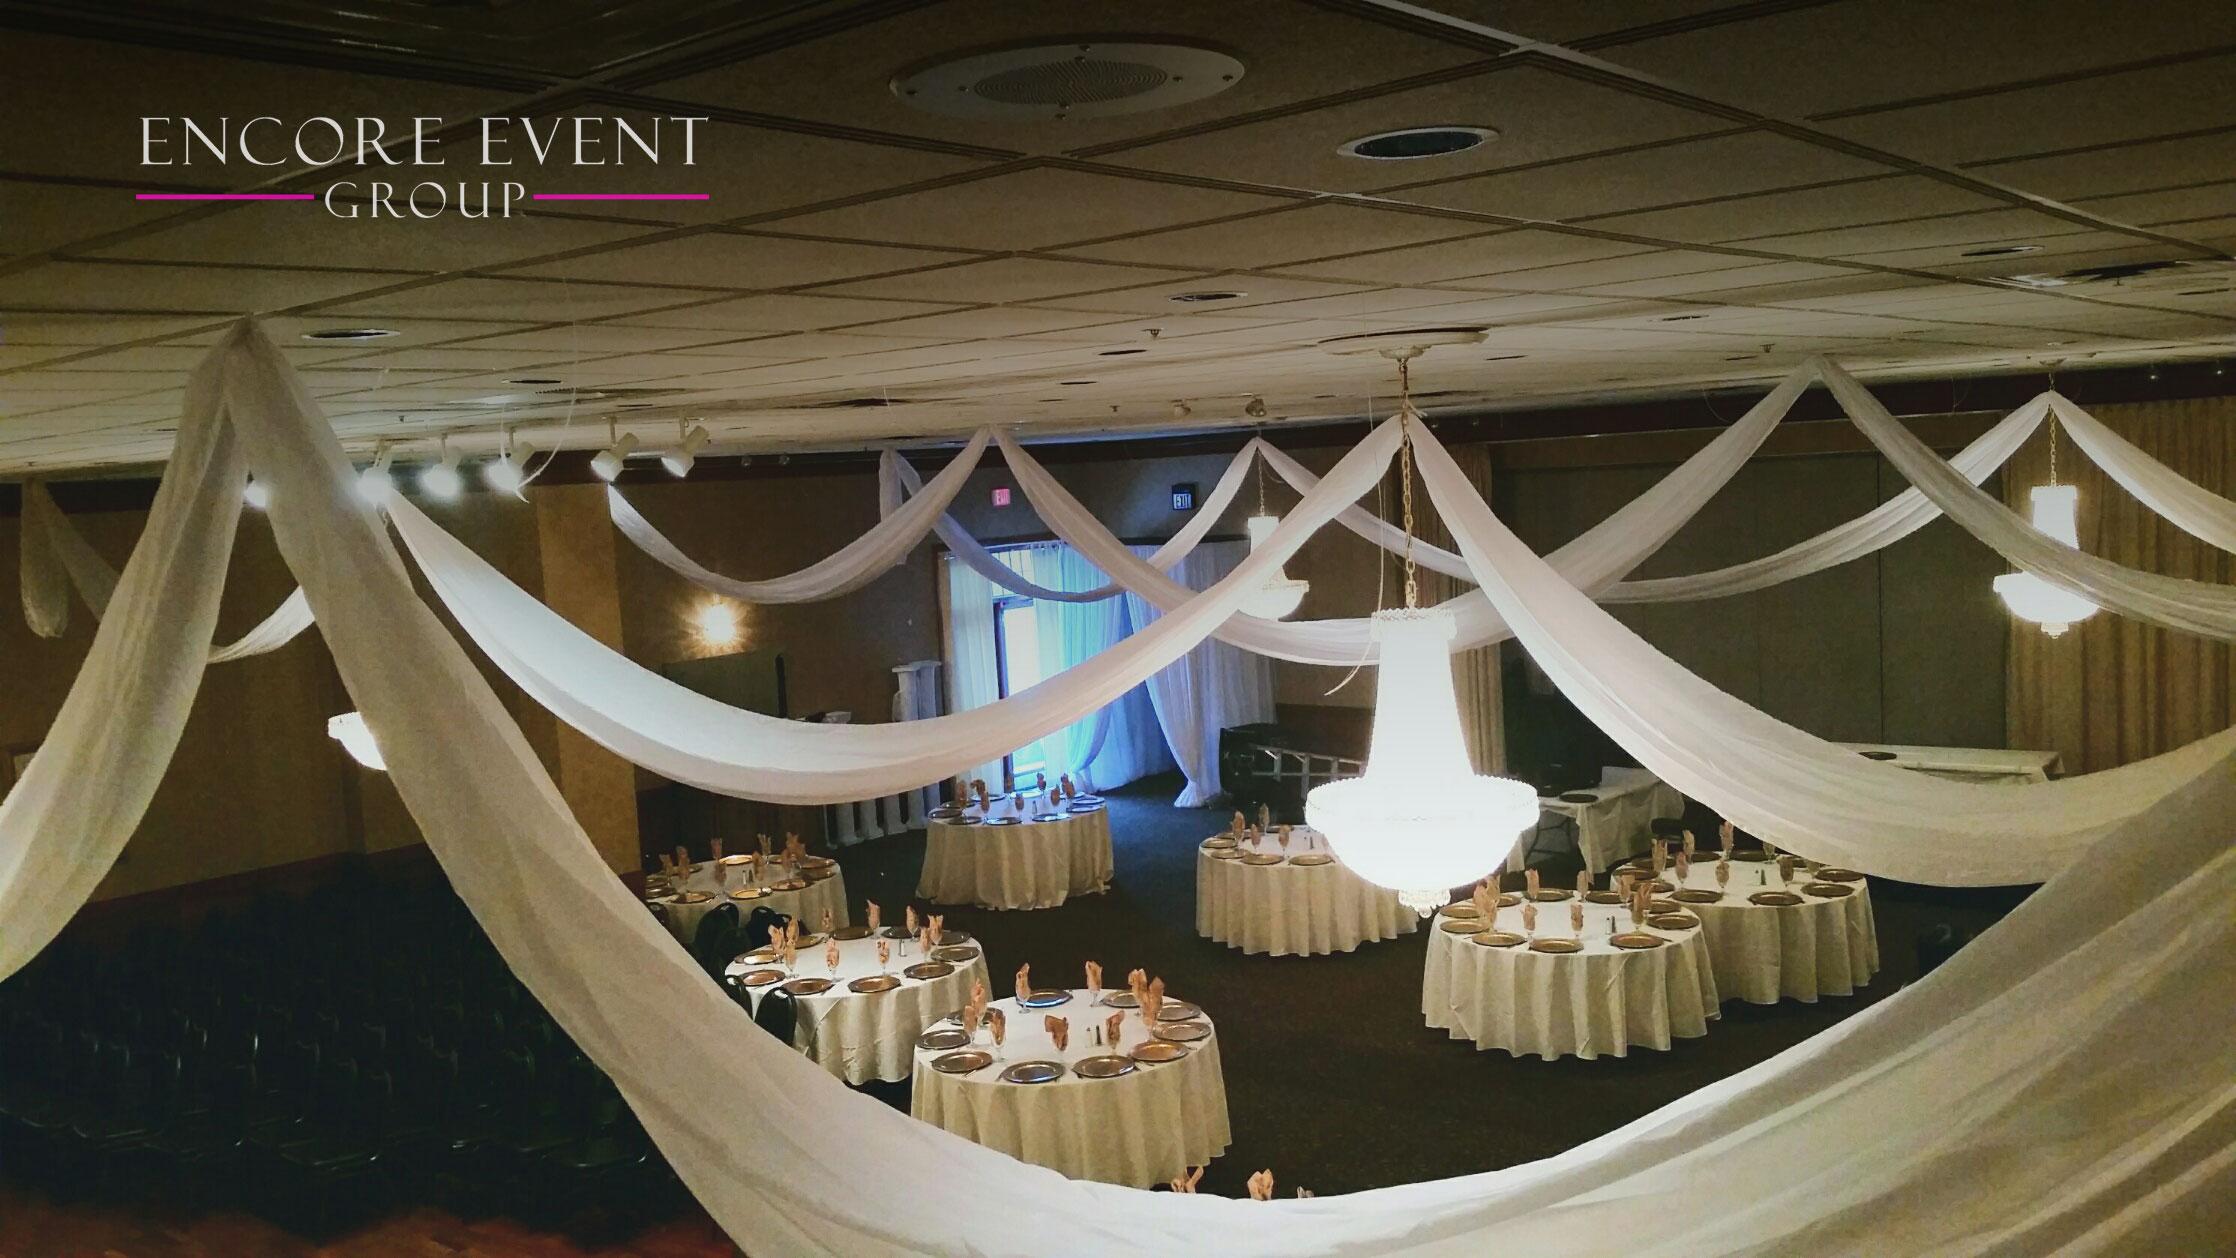 Pi Banquet Southfield Michigan Ceiling Drapery Encore